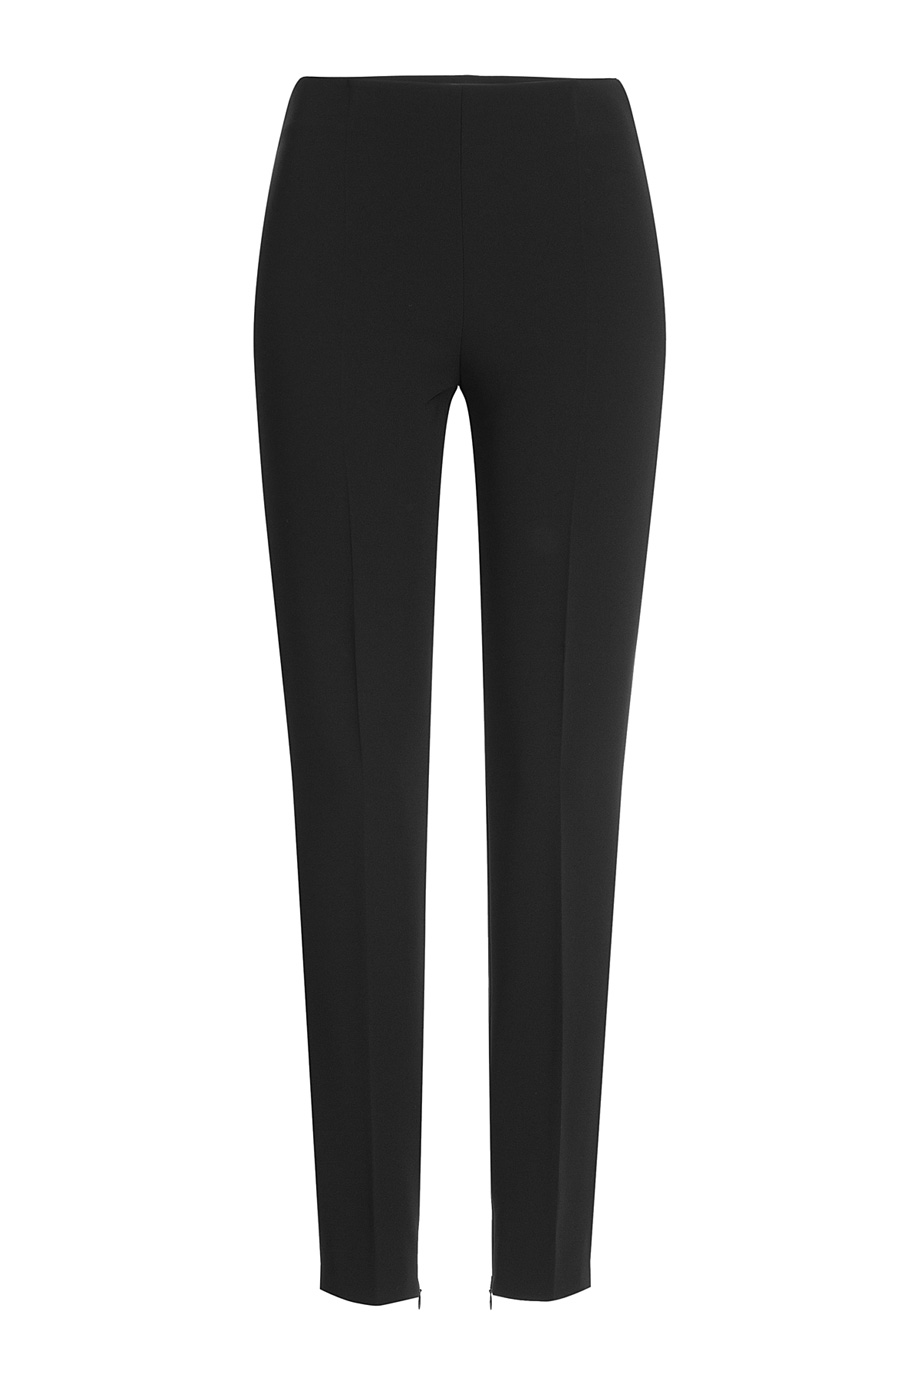 Moschino Skinny Pants In Black